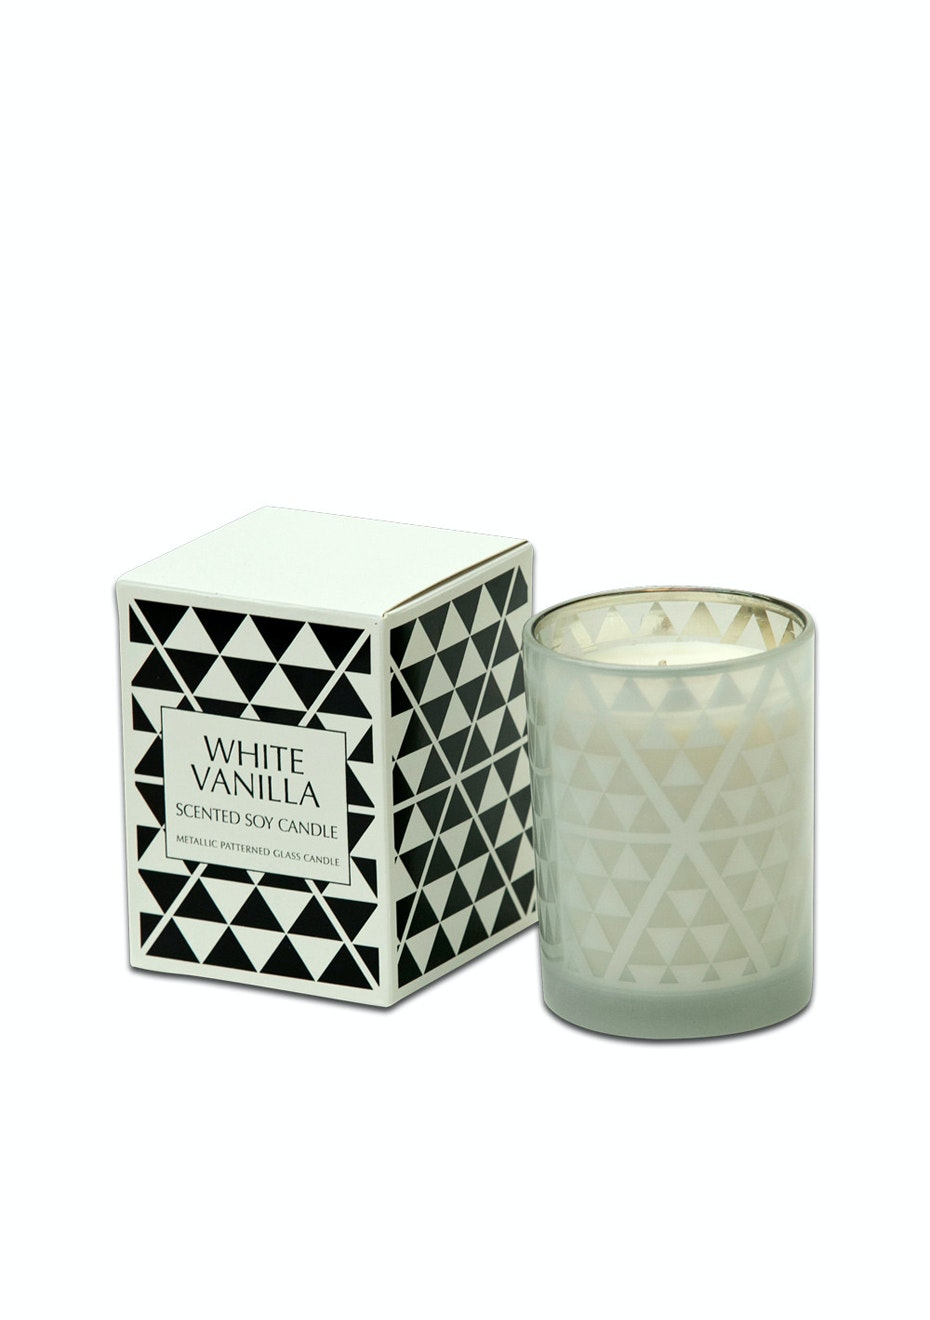 Me & My Trend - Geo White Vanilla Candle